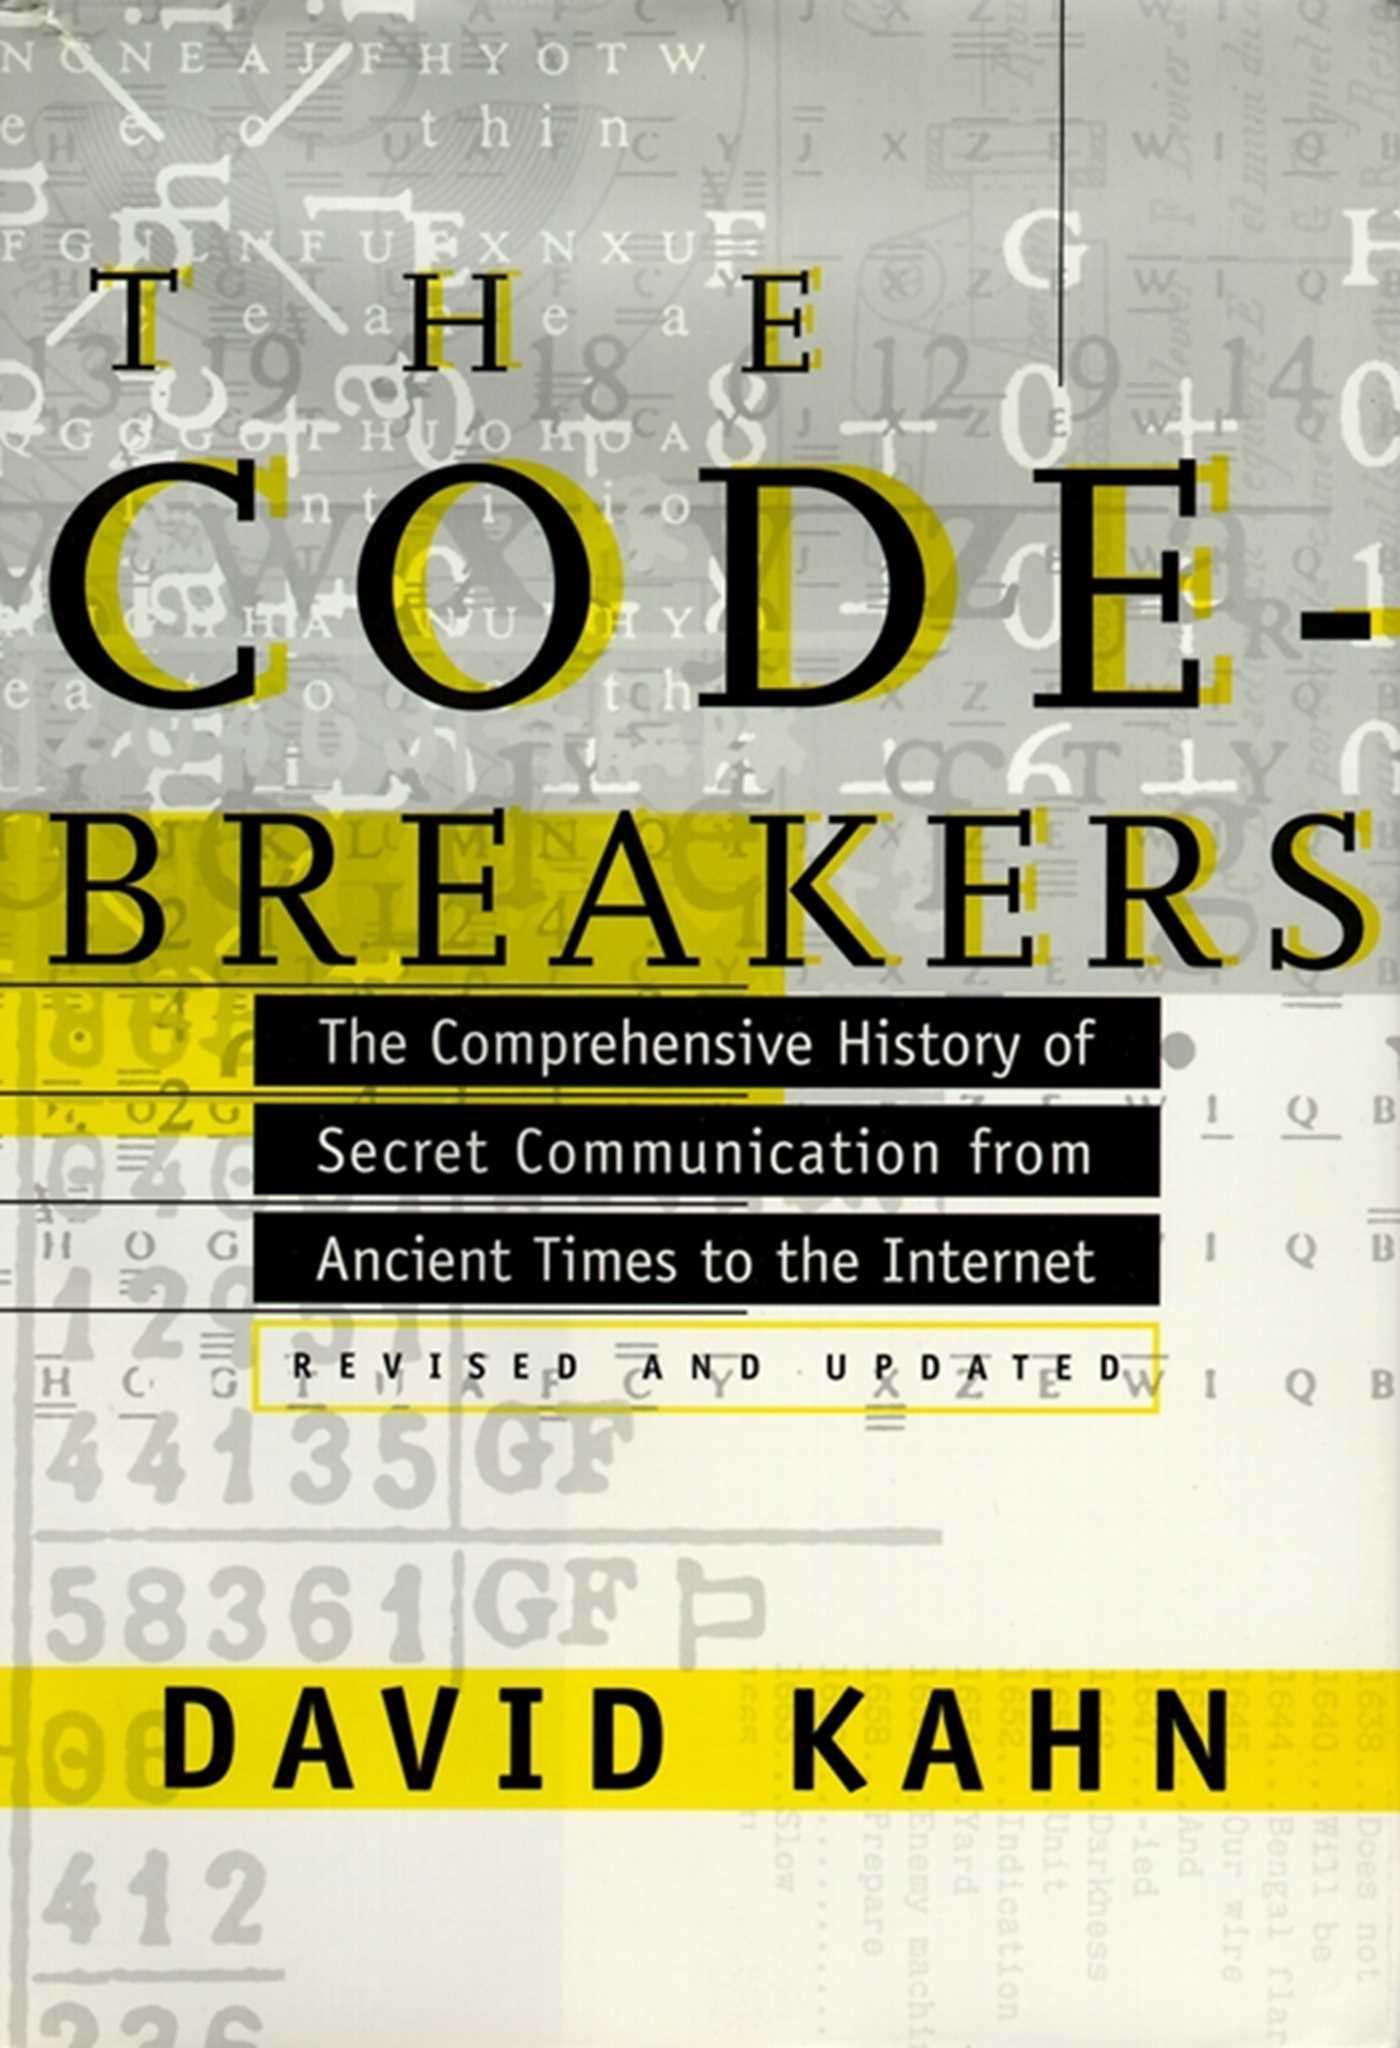 the codebreakers david kahn epub